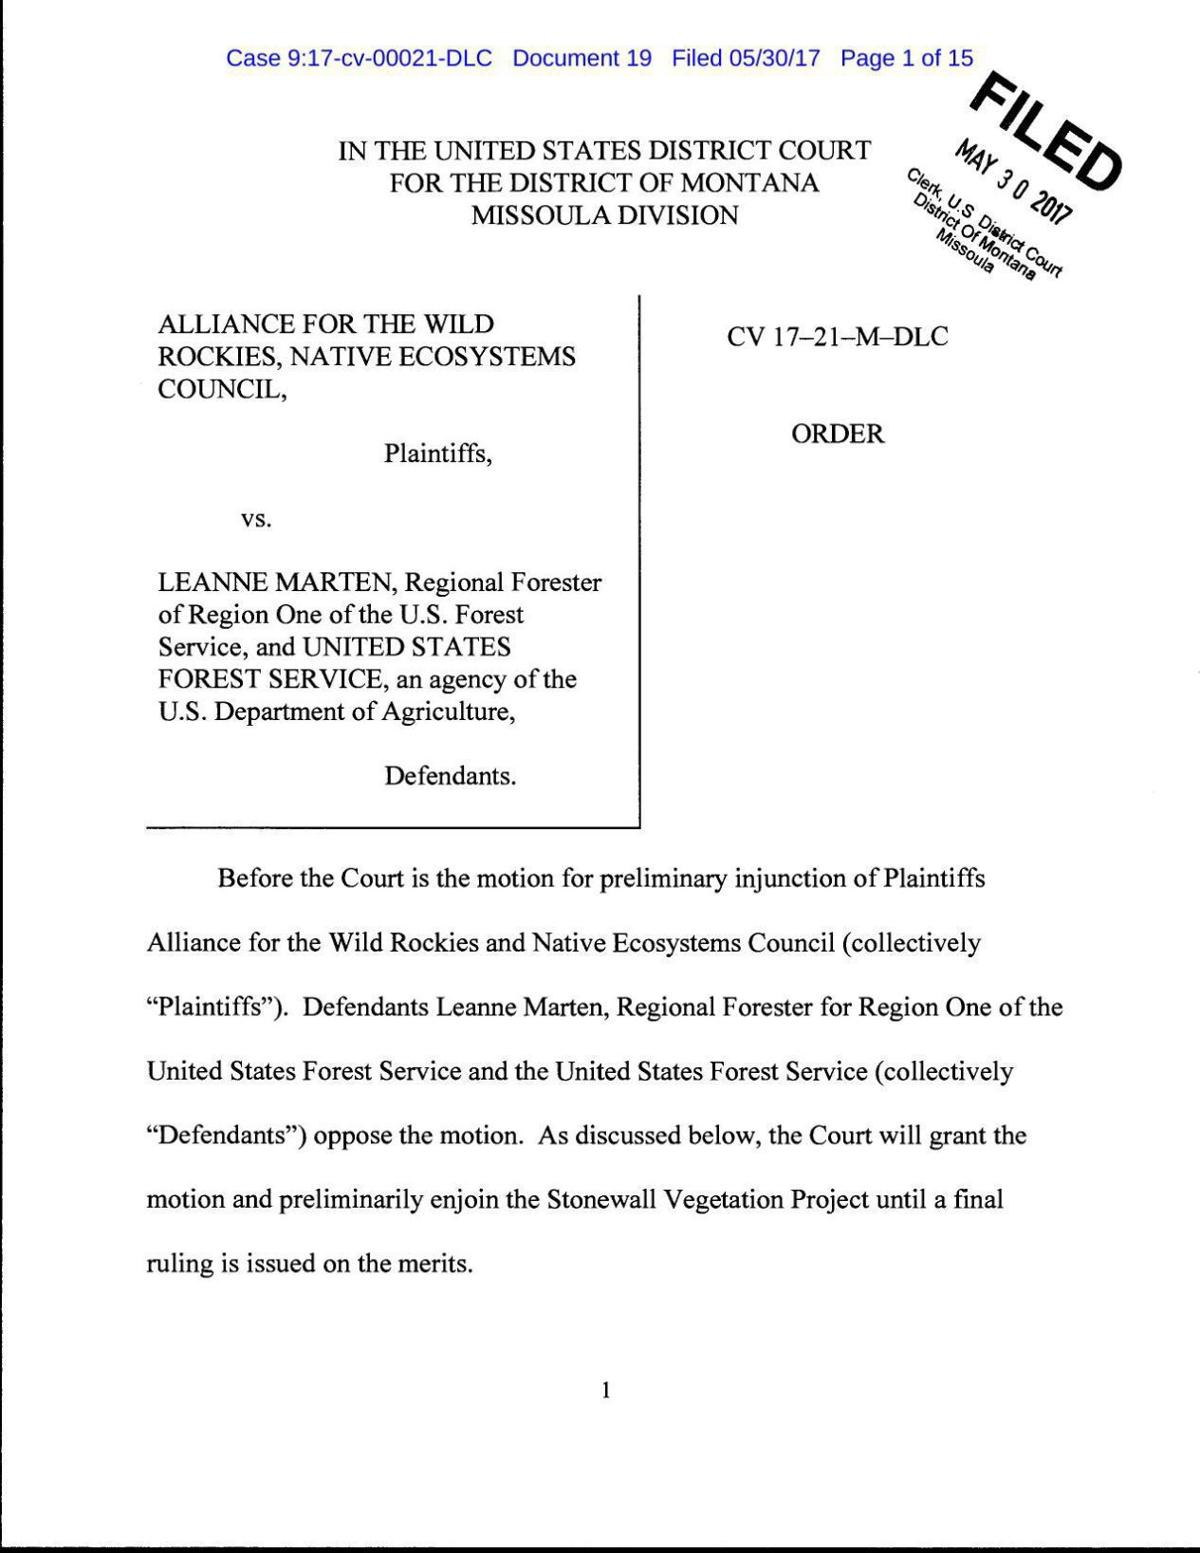 Stonewall Injunction